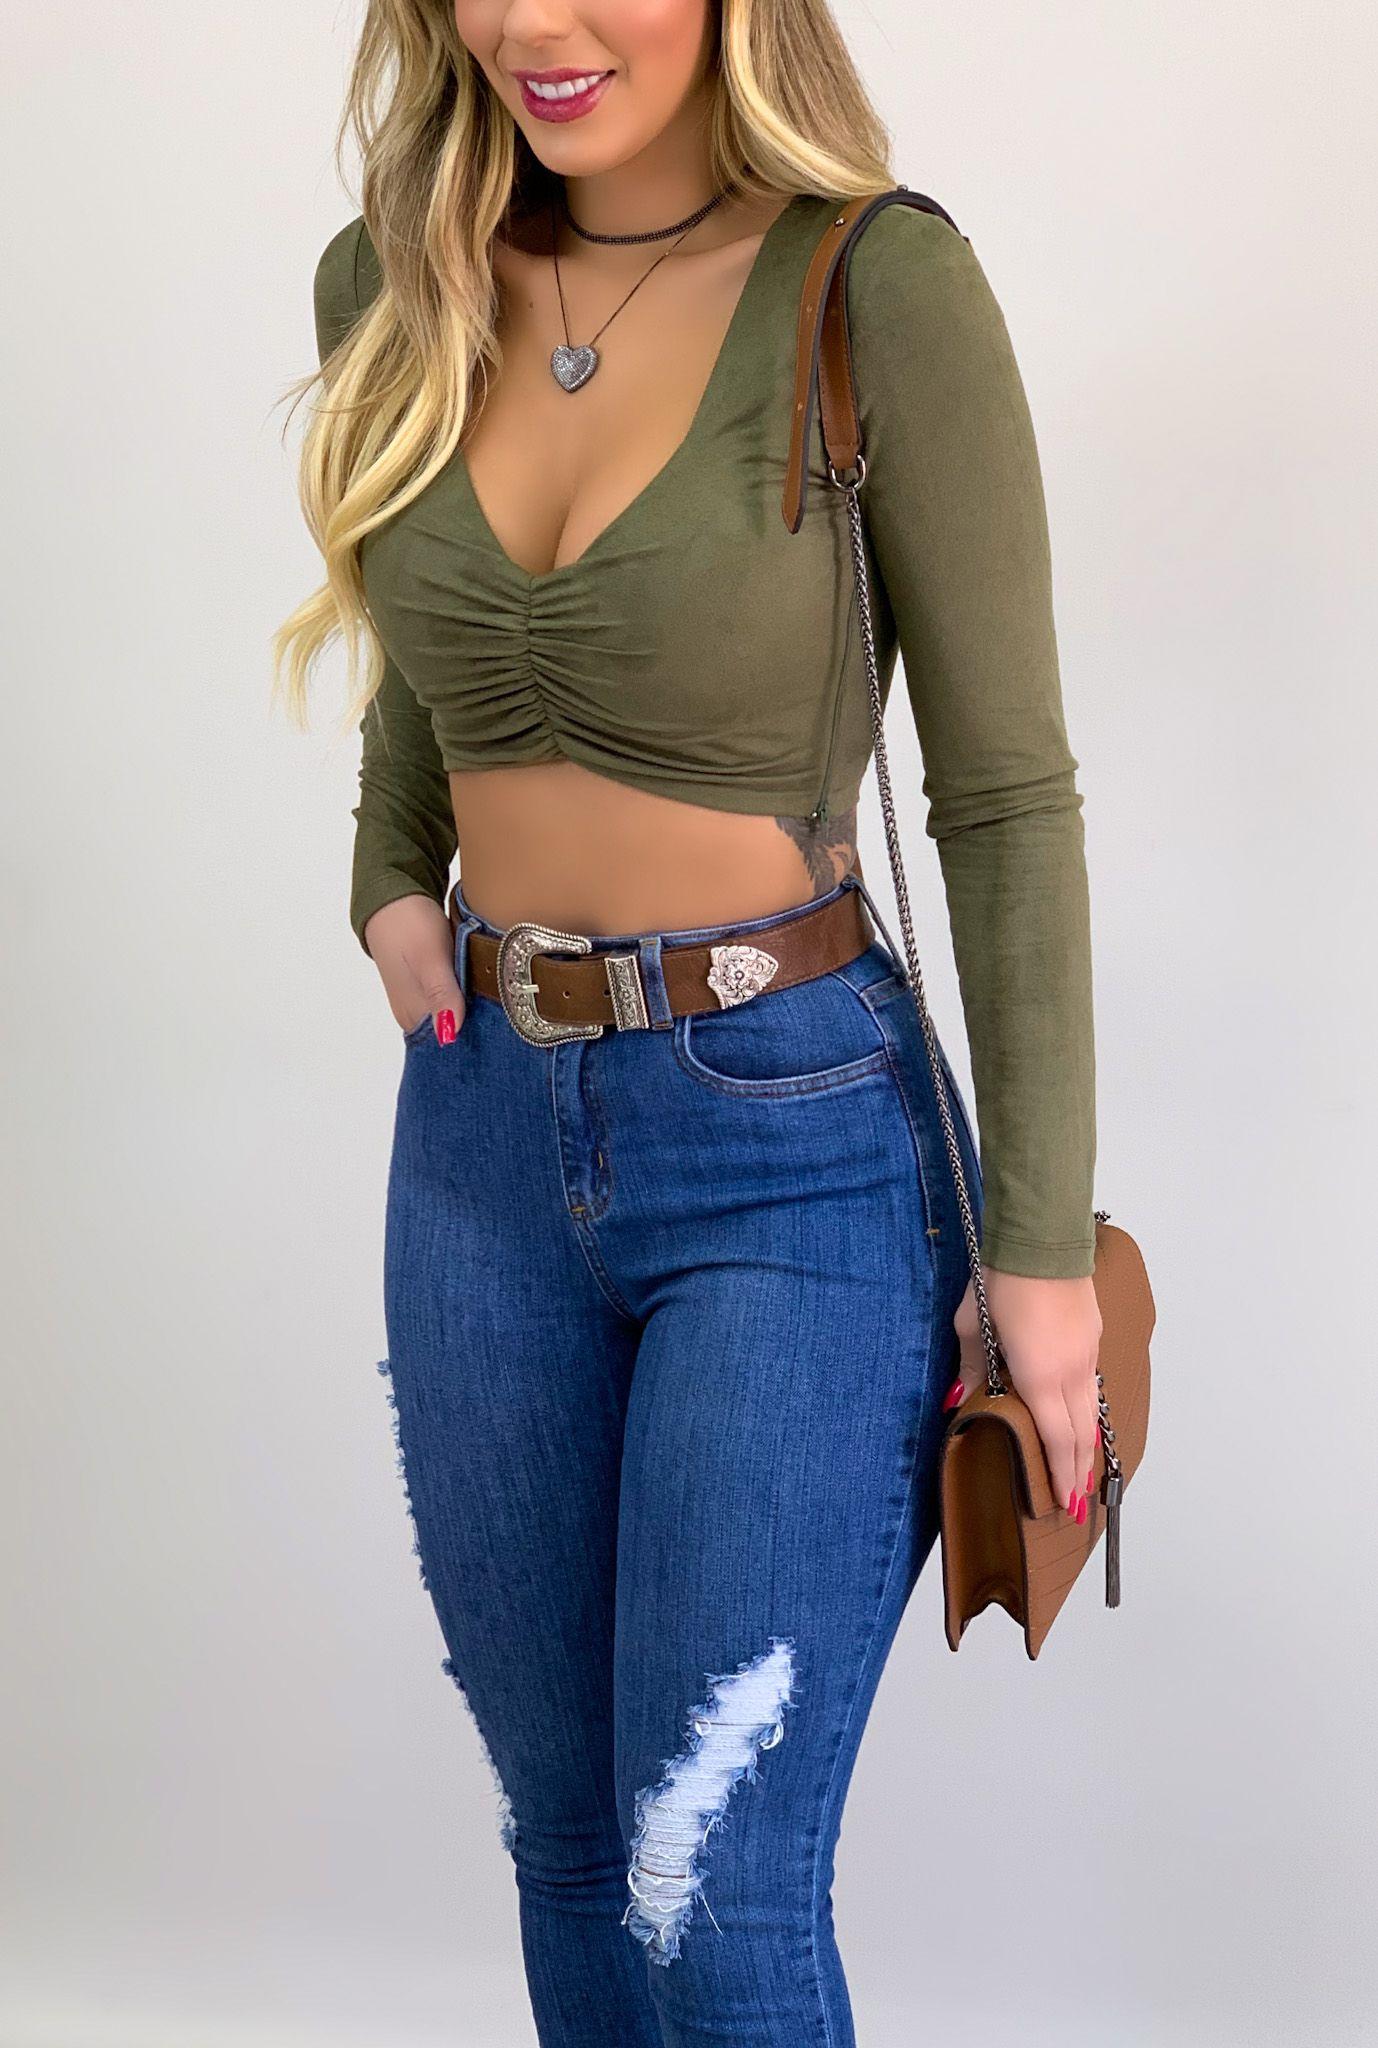 Cropped Suede c/ Drapeado Manga Longa Verde Militar | ONLAURI | Moda  feminina, Looks, Looks casuais